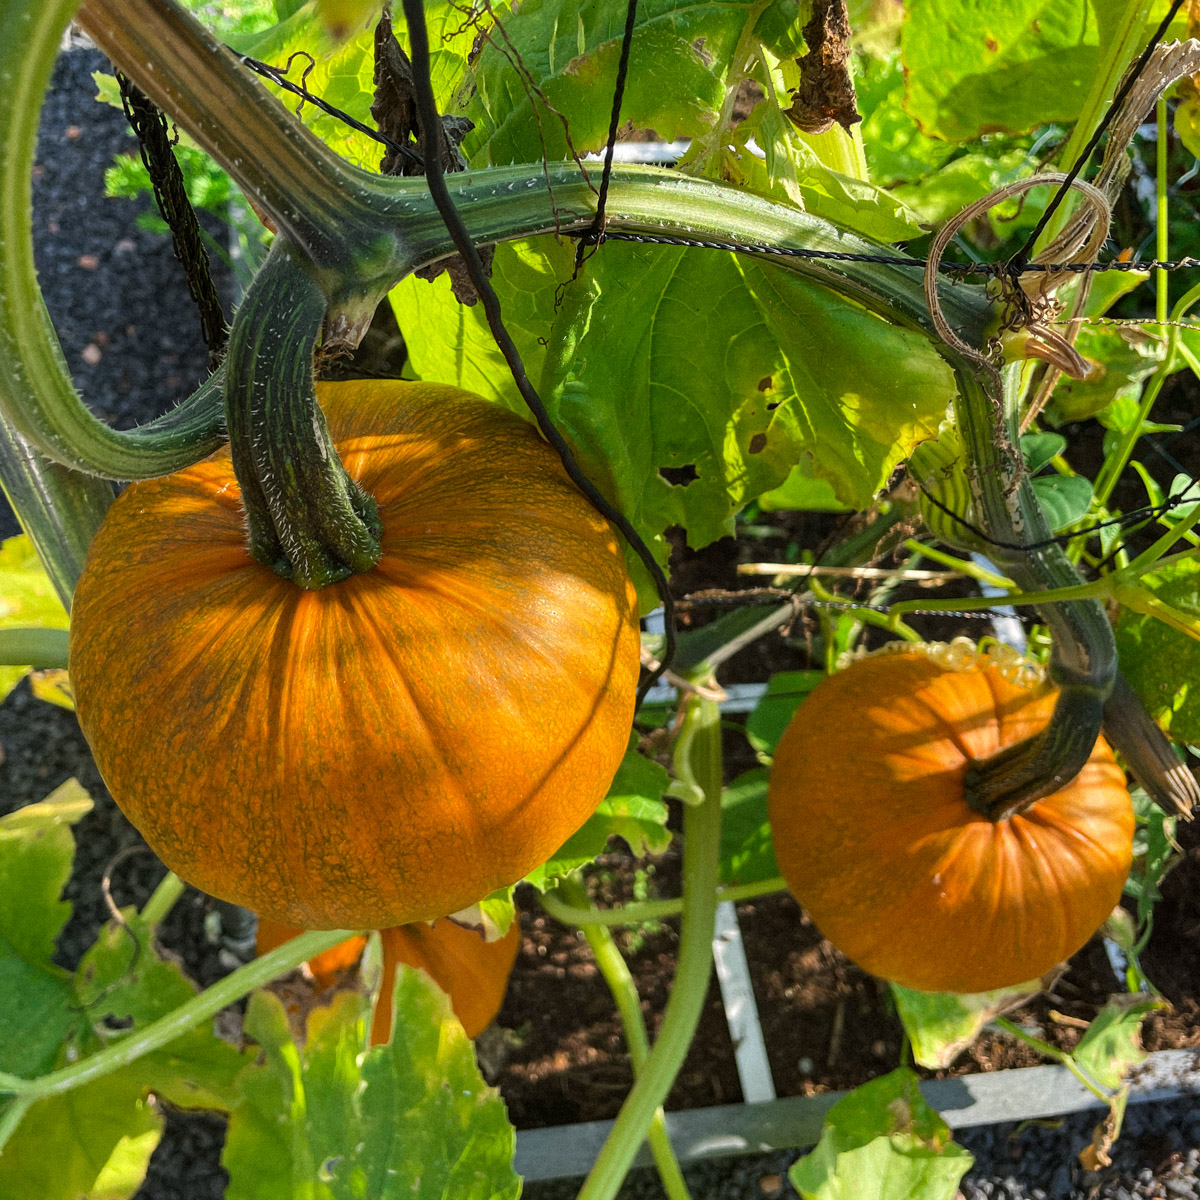 Seasonal-content_-Sept-in-the-planty-garden1.jpg